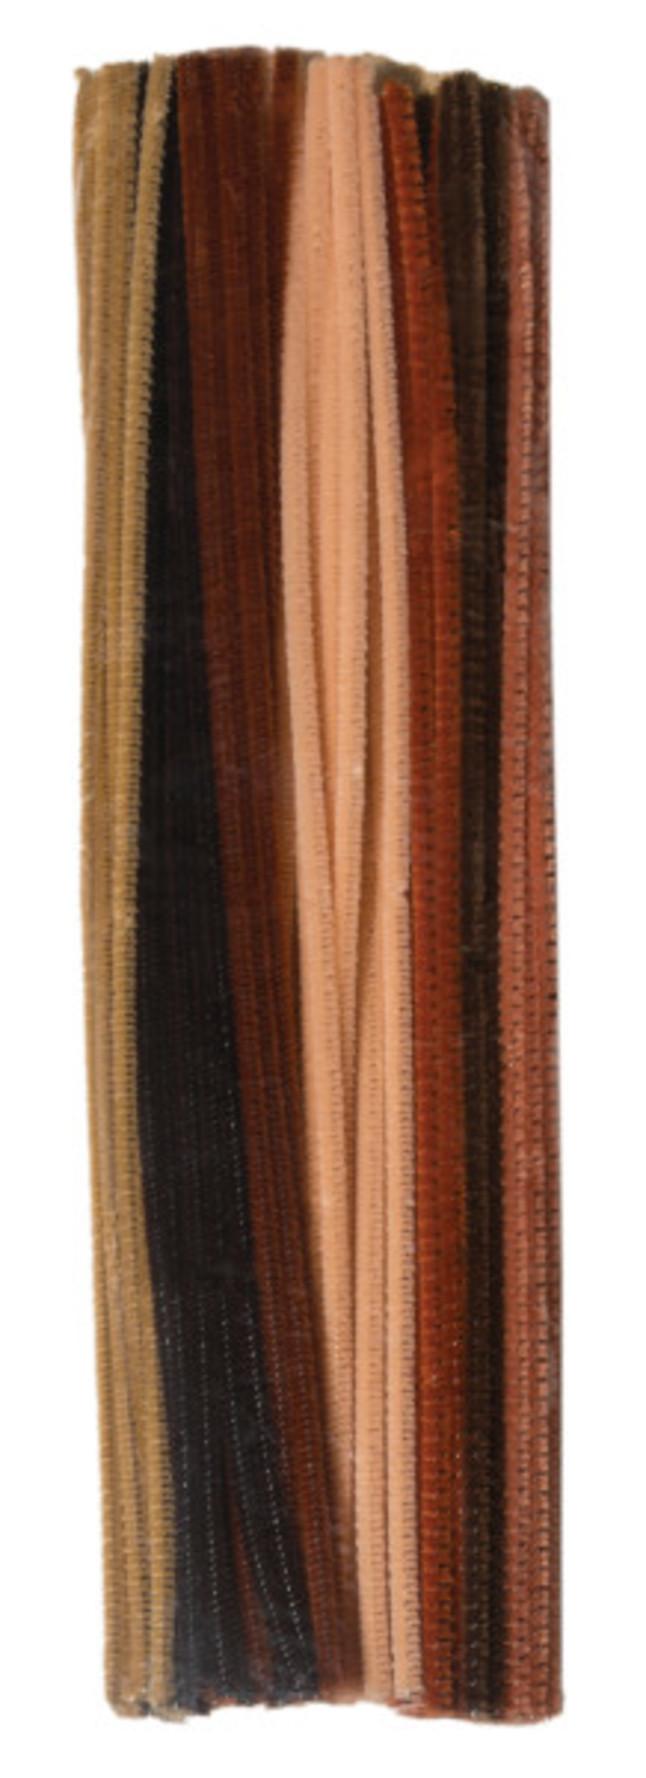 General Craft Supplies, Item Number 085825